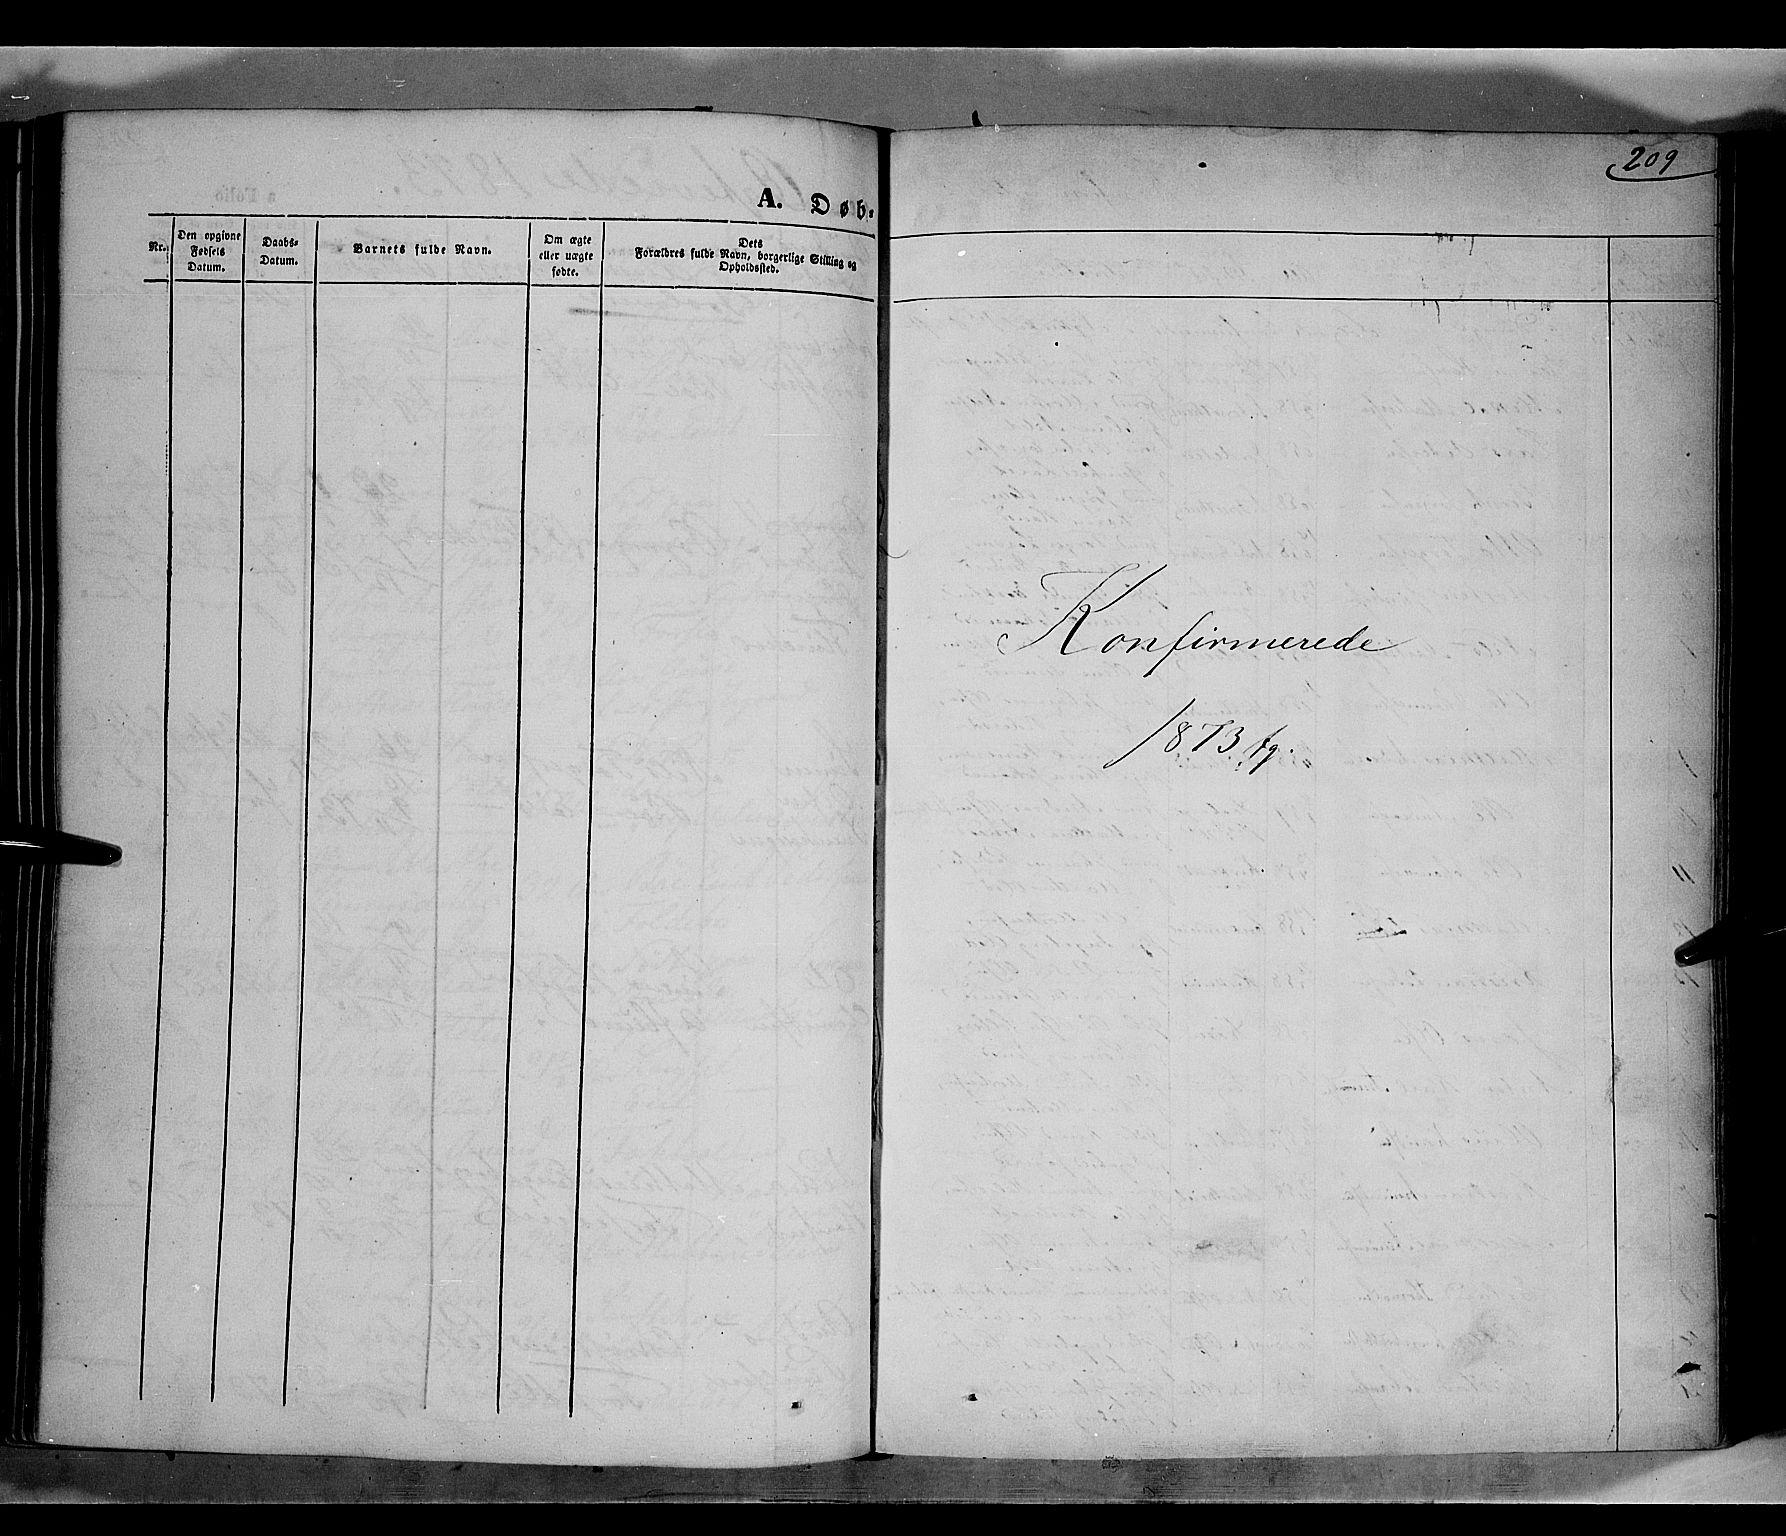 SAH, Gausdal prestekontor, Ministerialbok nr. 9, 1862-1873, s. 209